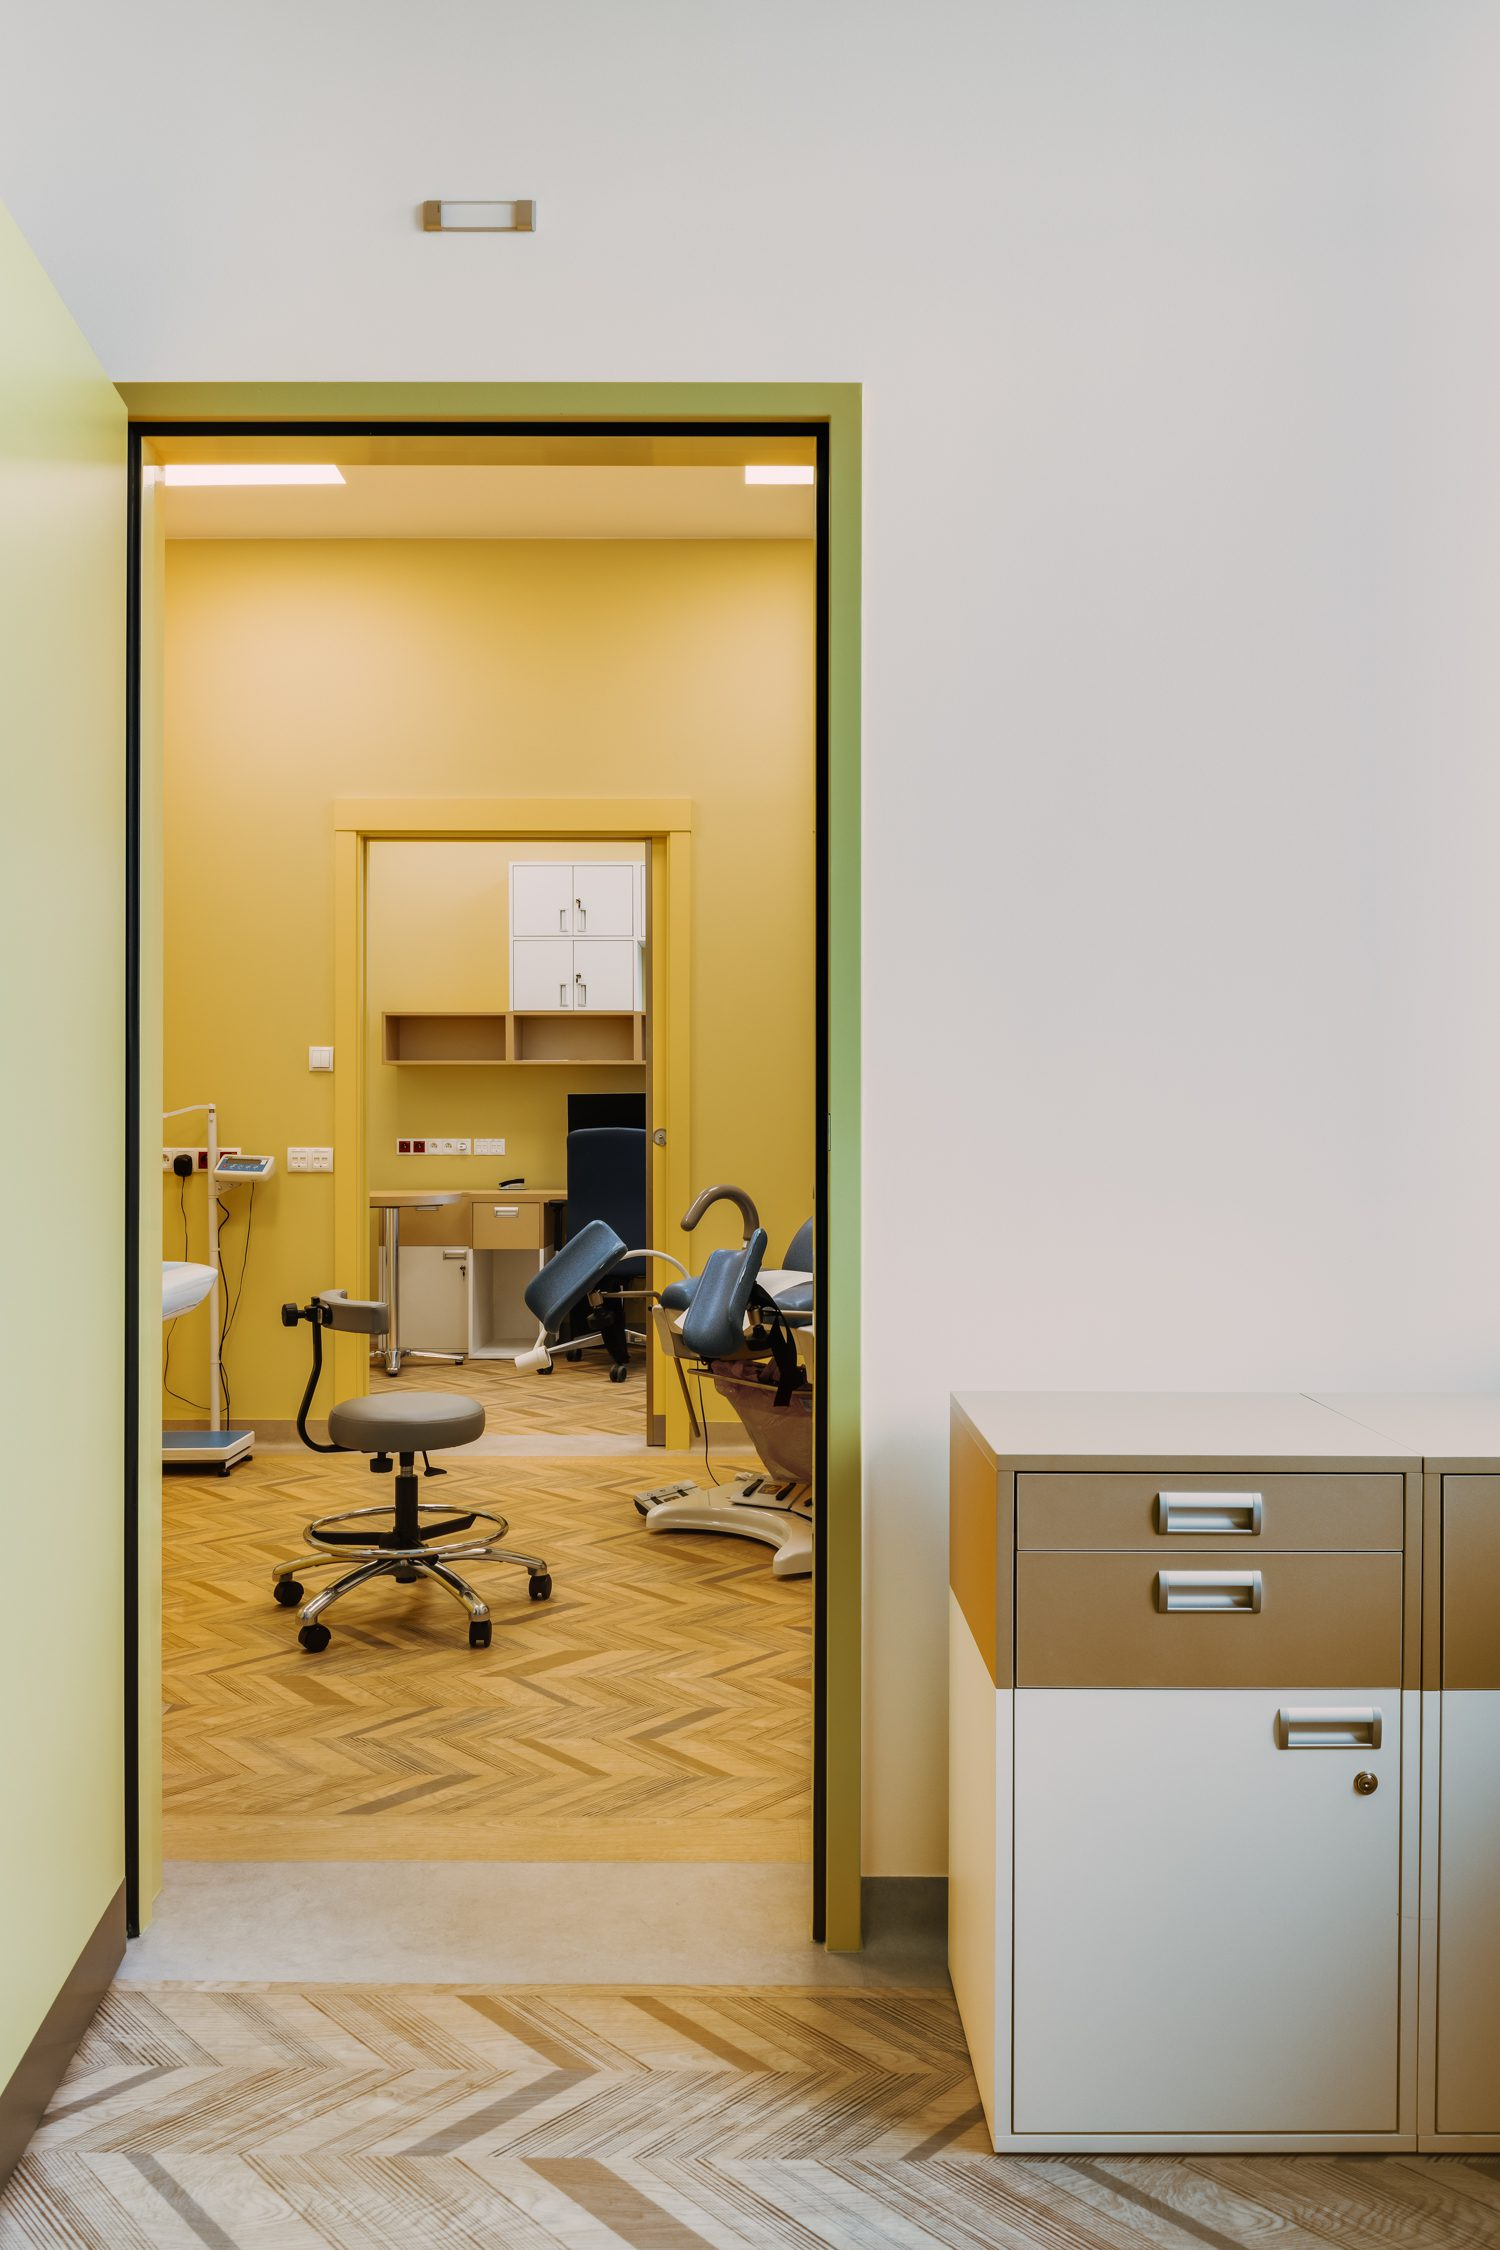 Patient treatment rooms have herringbone faux wood floors—actually rendered in homogeneous surfacing by Gerflor.